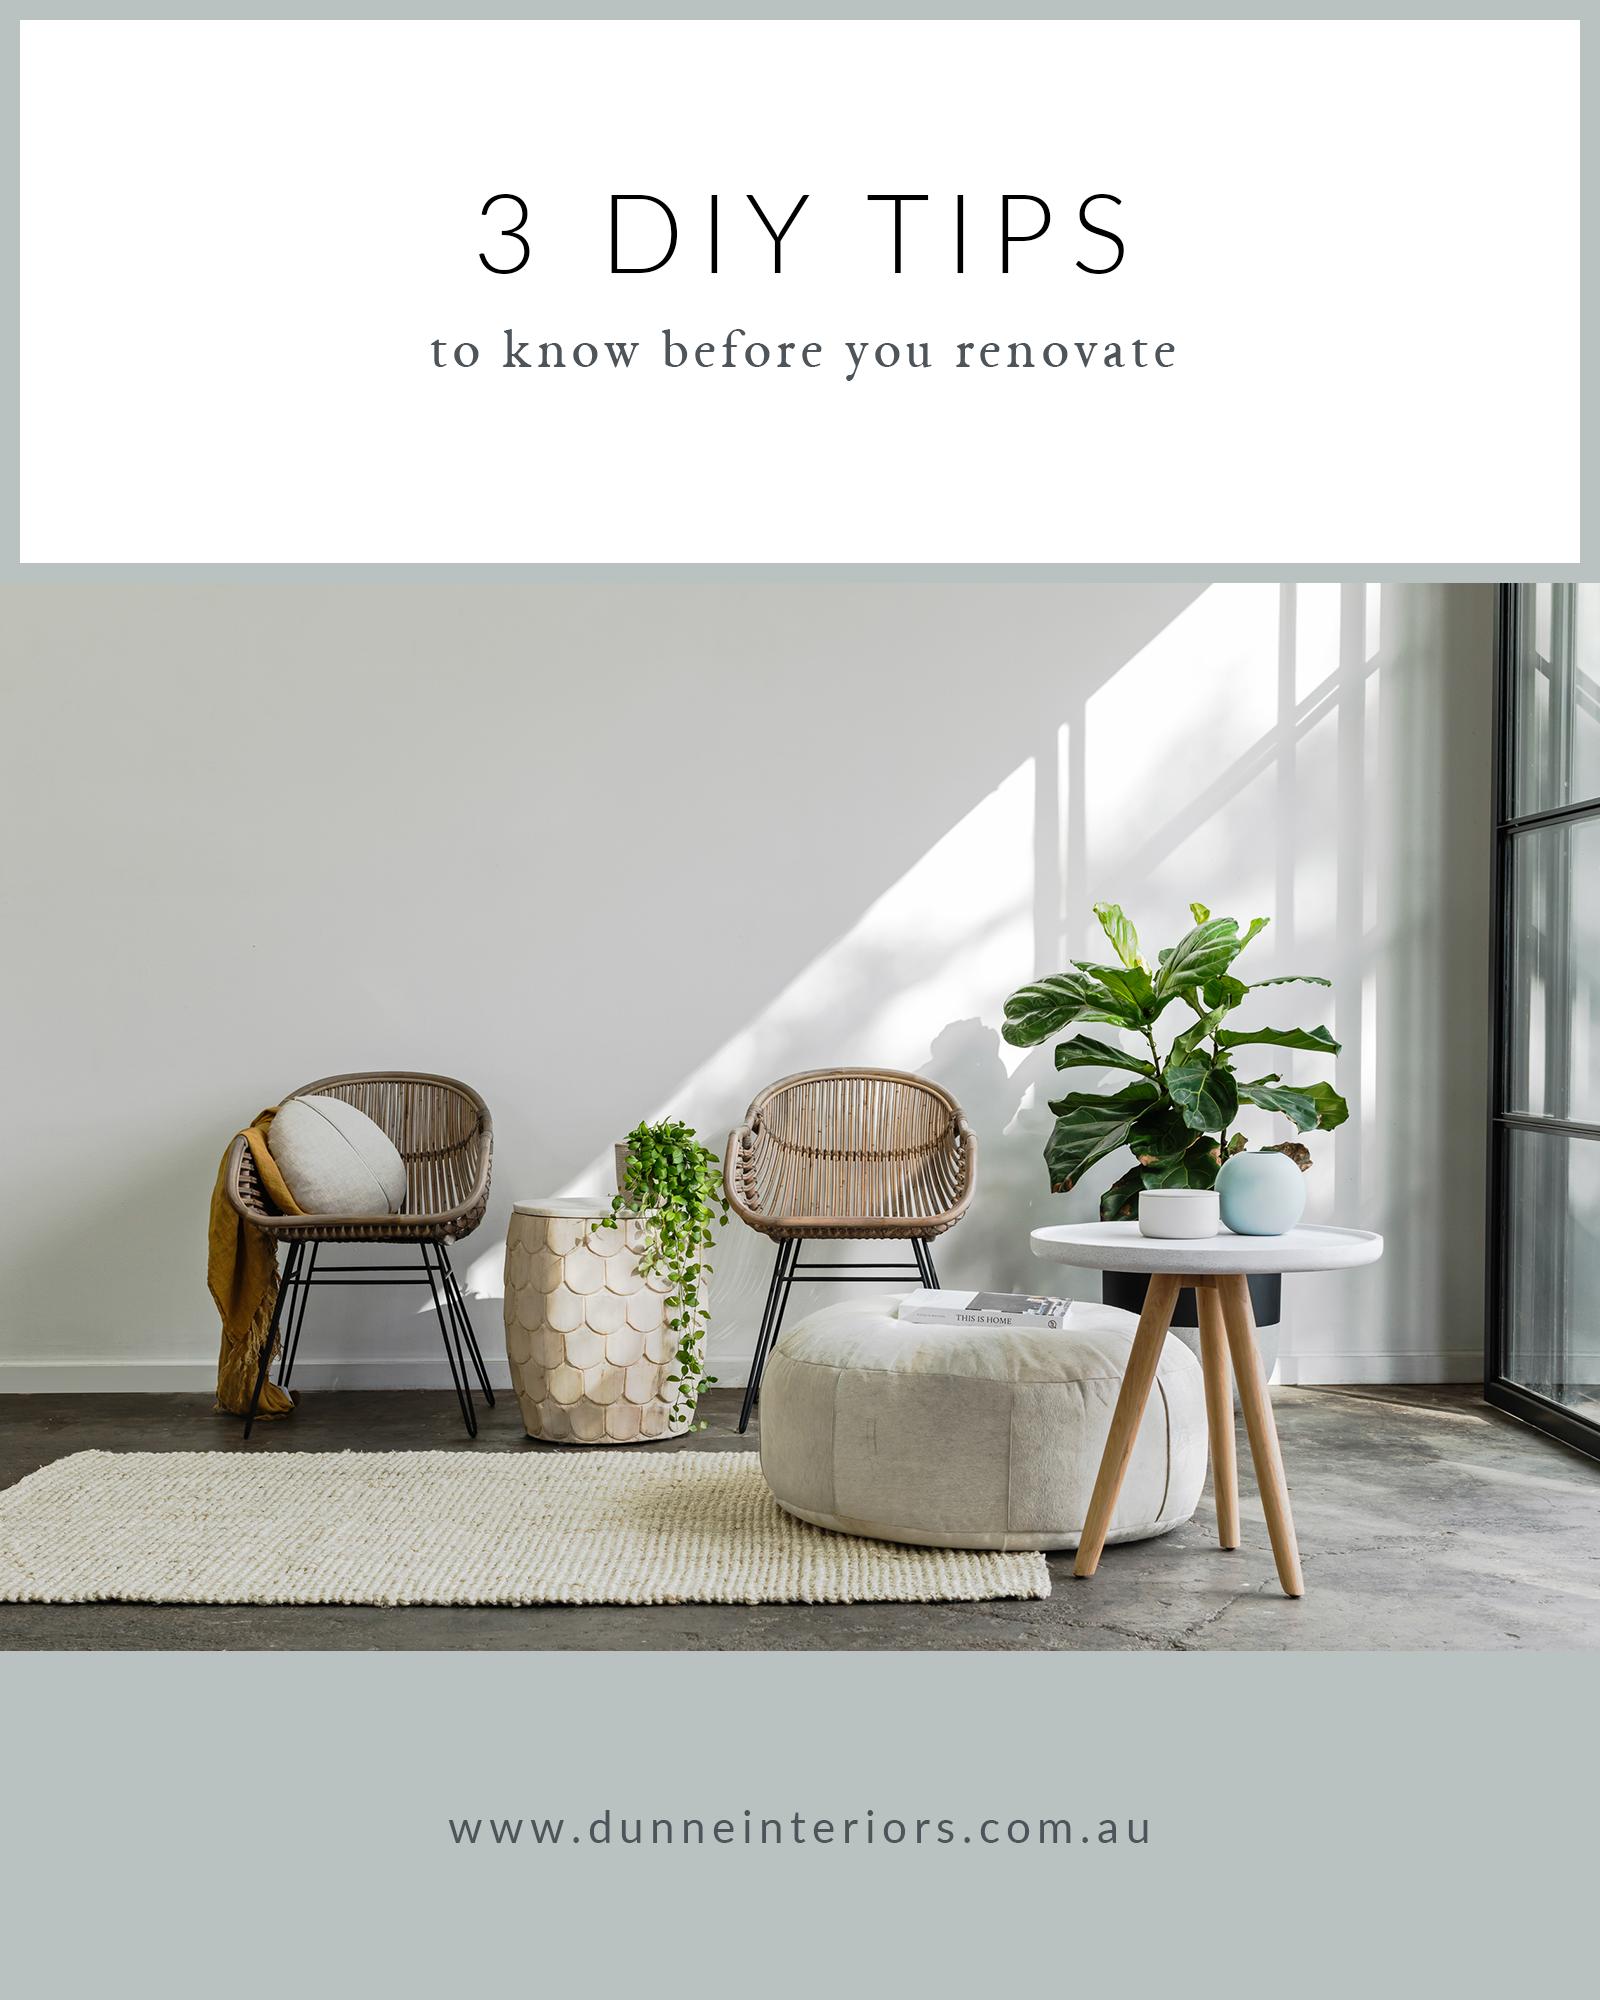 3-diy-tips-before-you-renovate.png